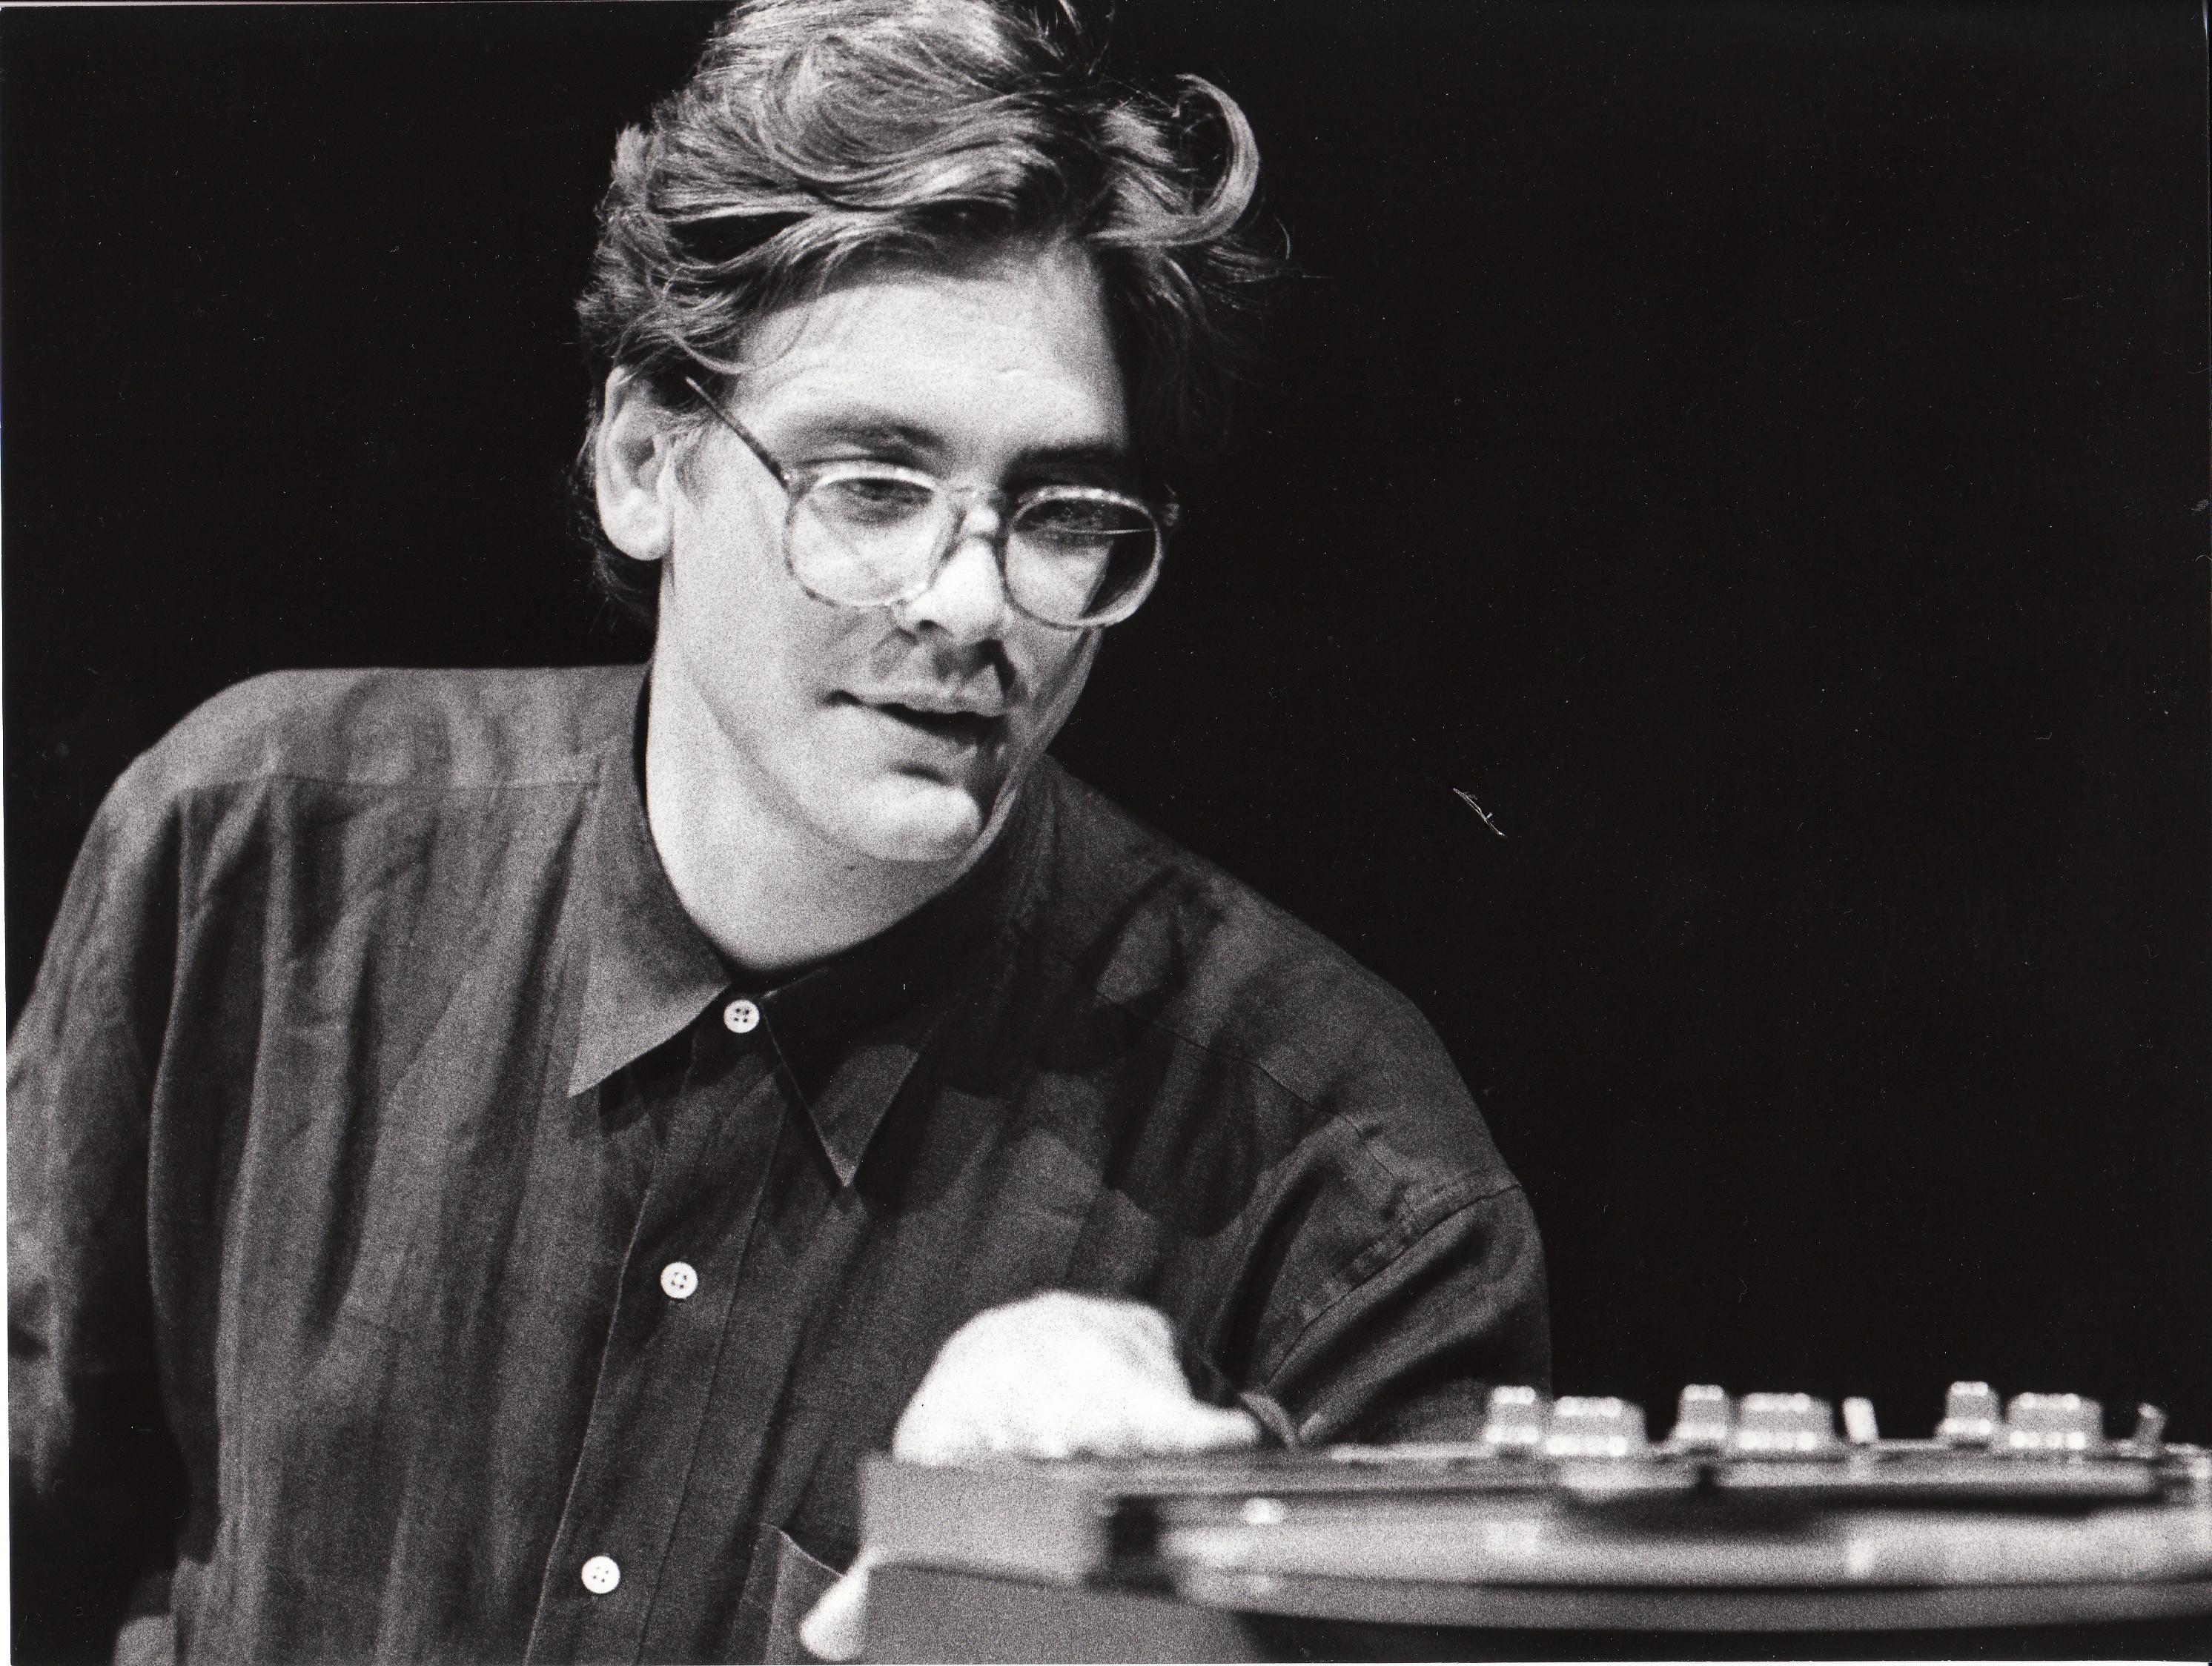 Gregory Whitehead Portrait Image